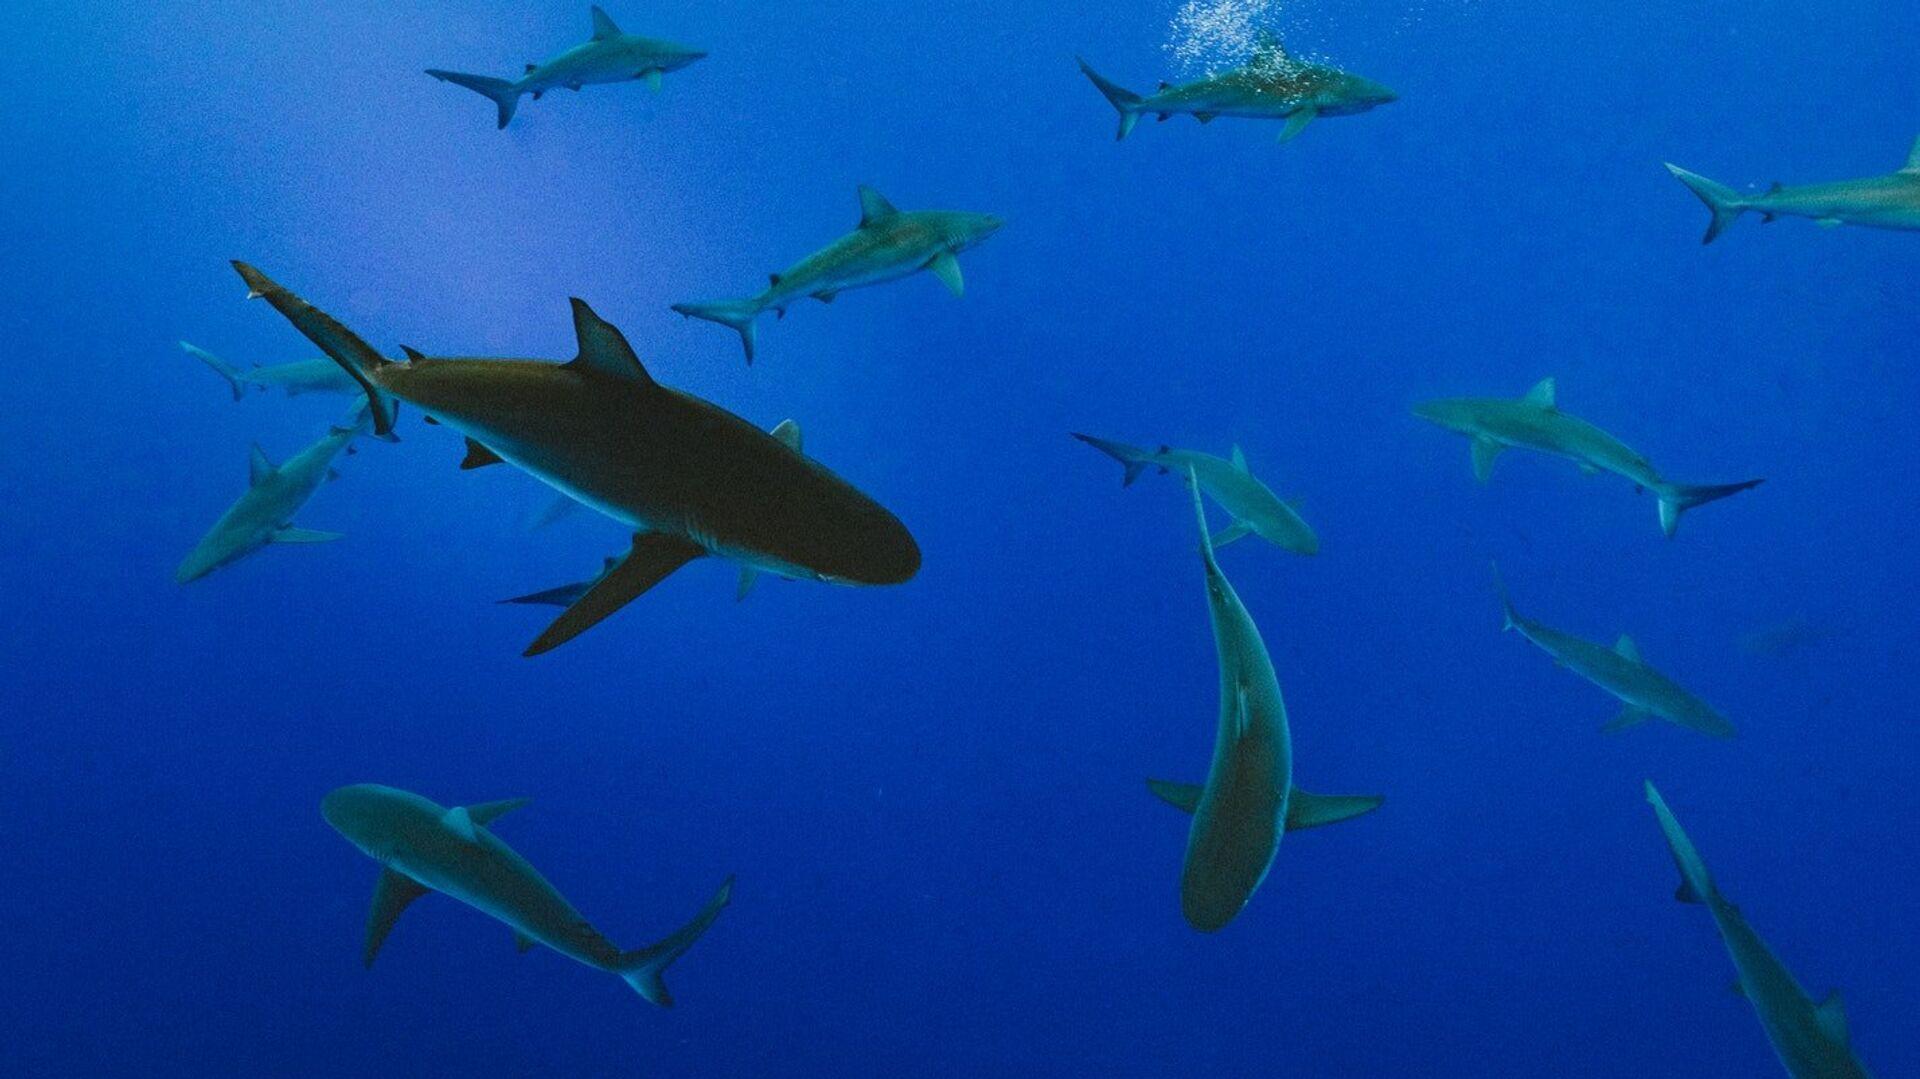 Tiburones, imagen referencial - Sputnik Mundo, 1920, 12.08.2021